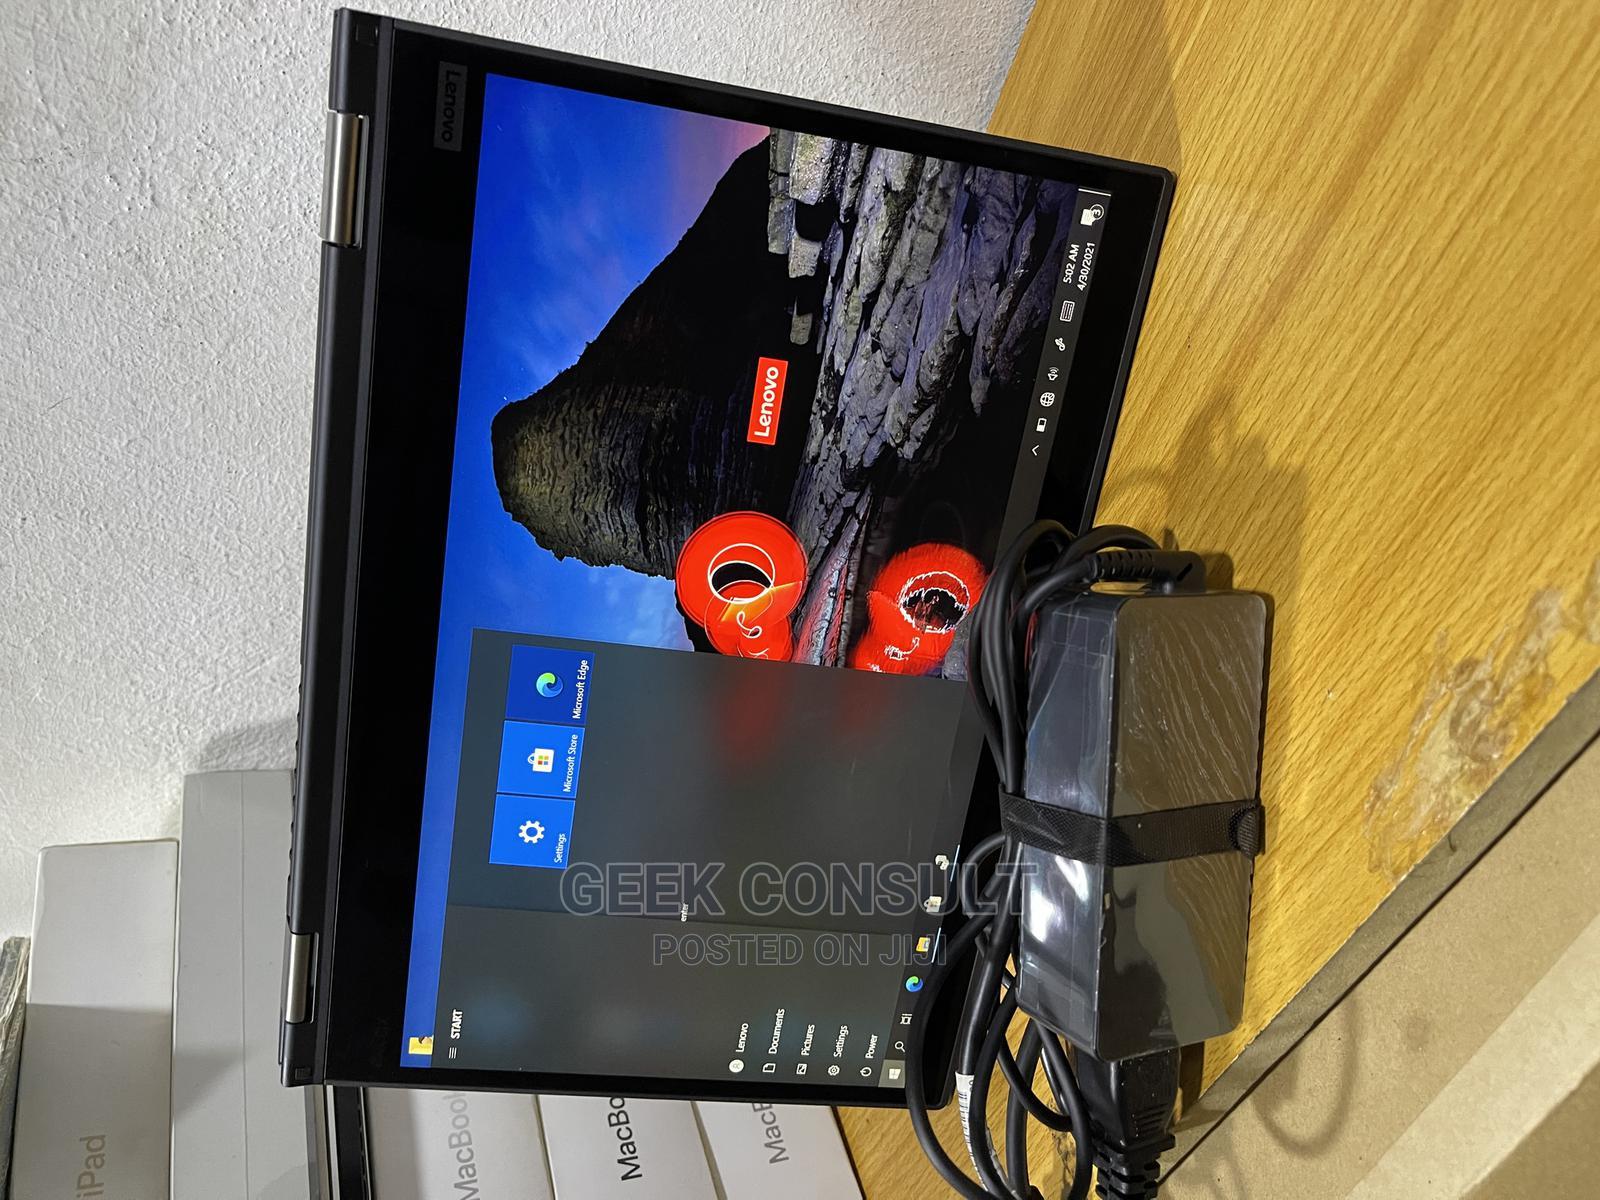 New Laptop Lenovo ThinkPad Yoga 8GB Intel Core I5 SSD 256GB | Laptops & Computers for sale in Lekki, Lagos State, Nigeria